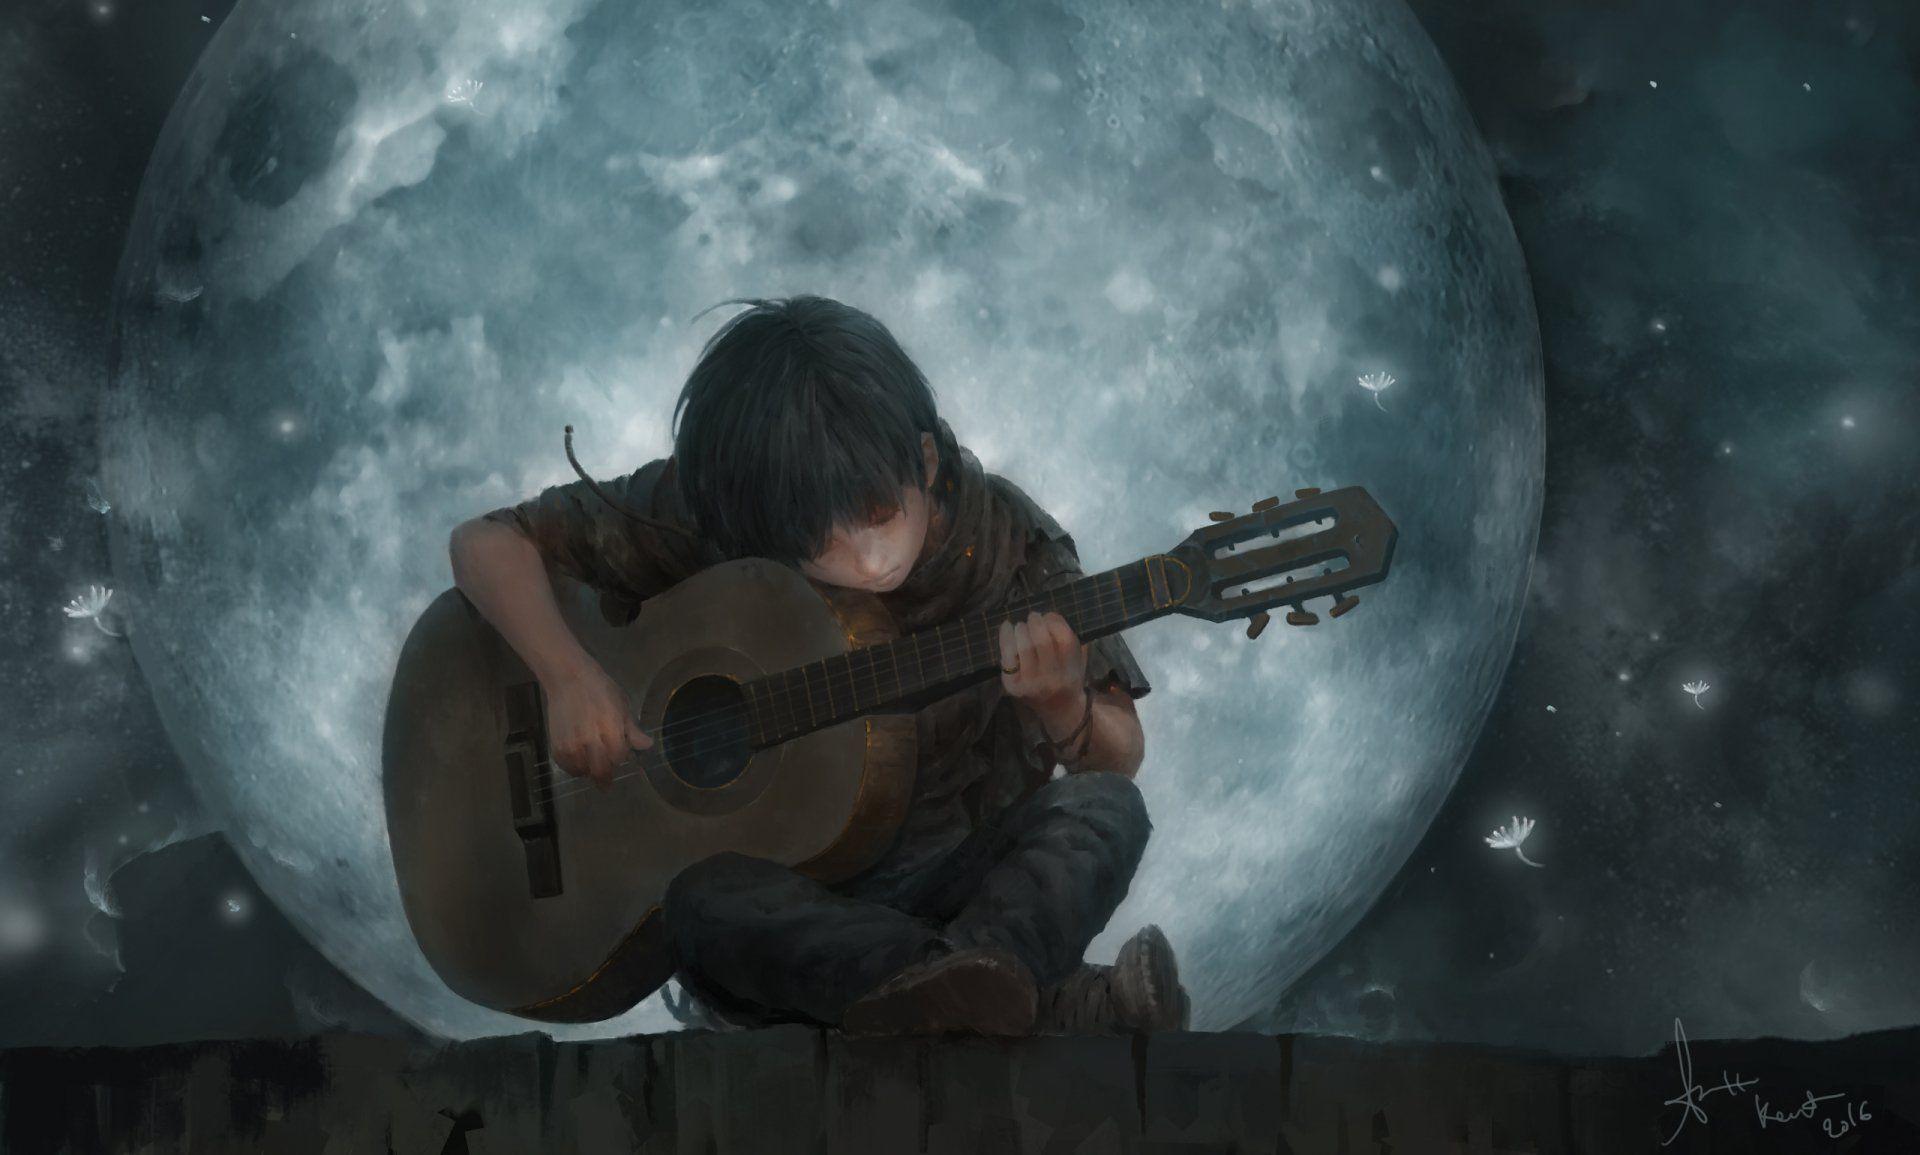 Artistic Child Moon Guitar Boy Wallpaper Anime Scenery Wallpaper Anime Scenery Guitar Art